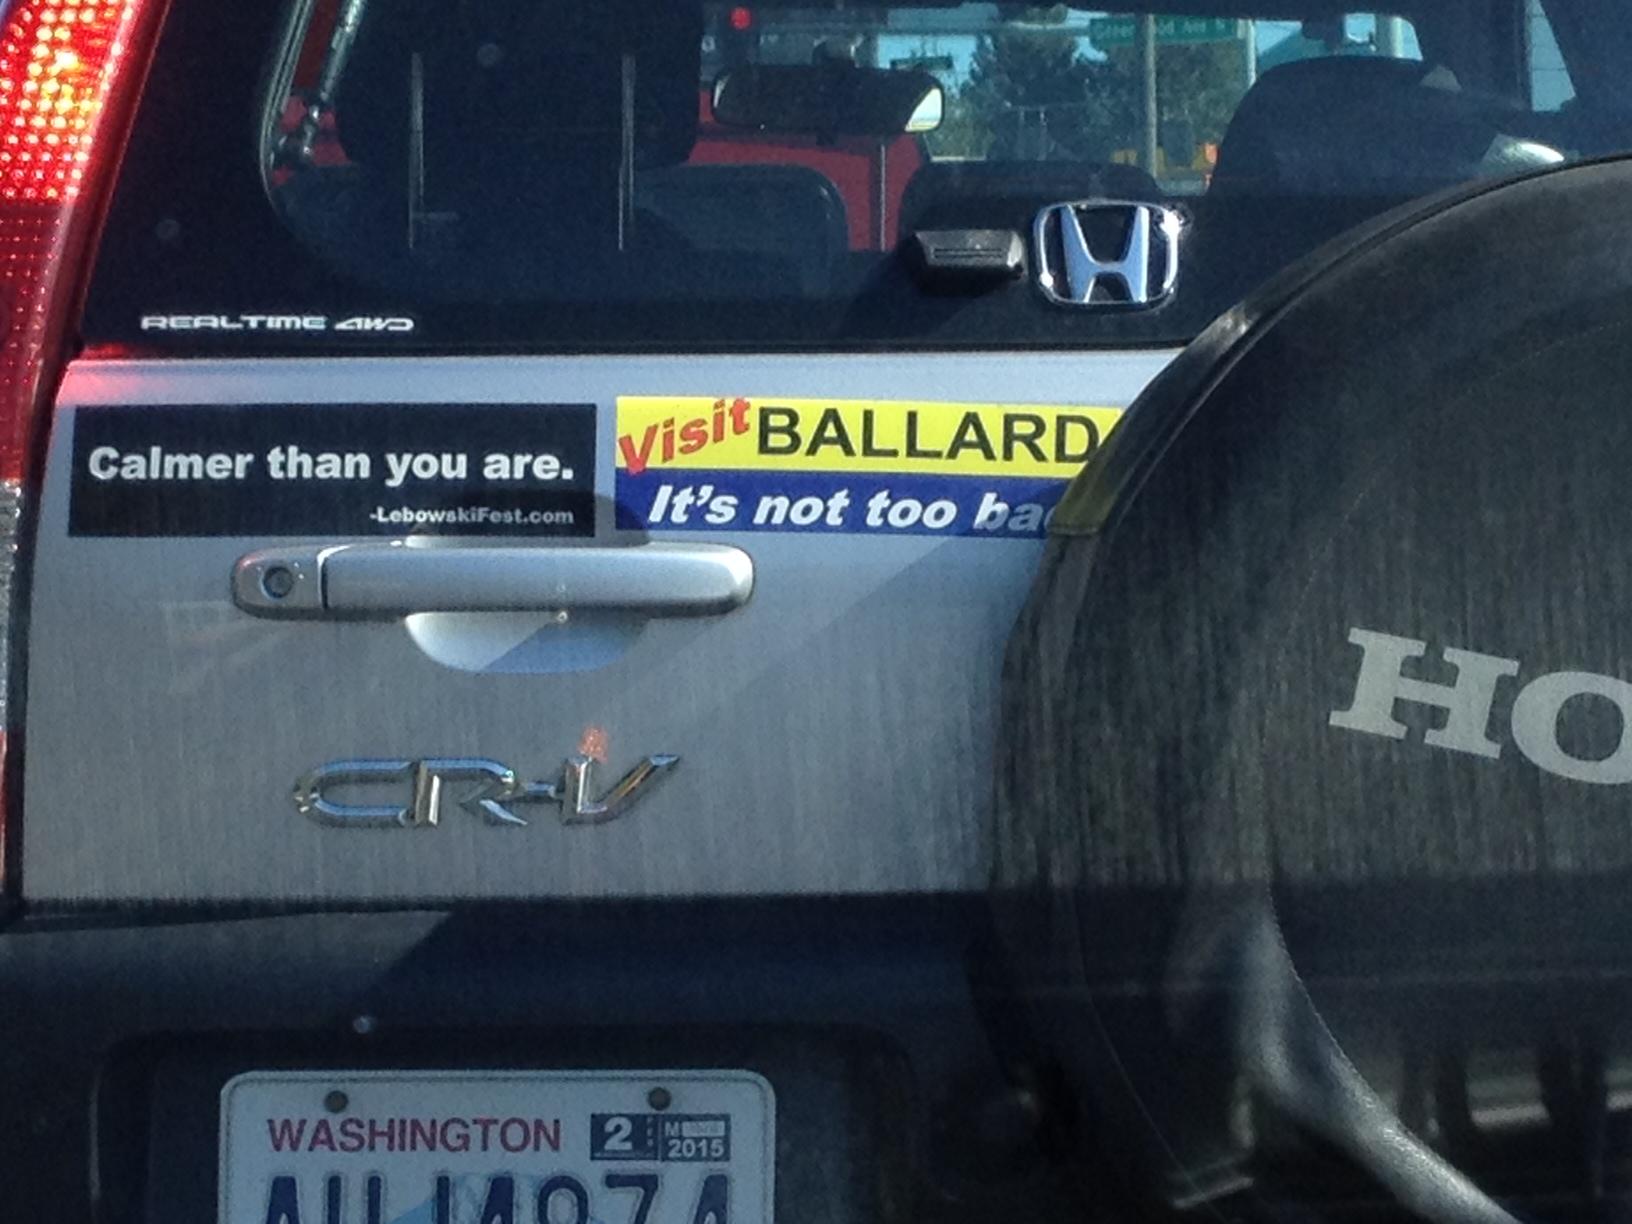 Good, old fashioned Ballard humility